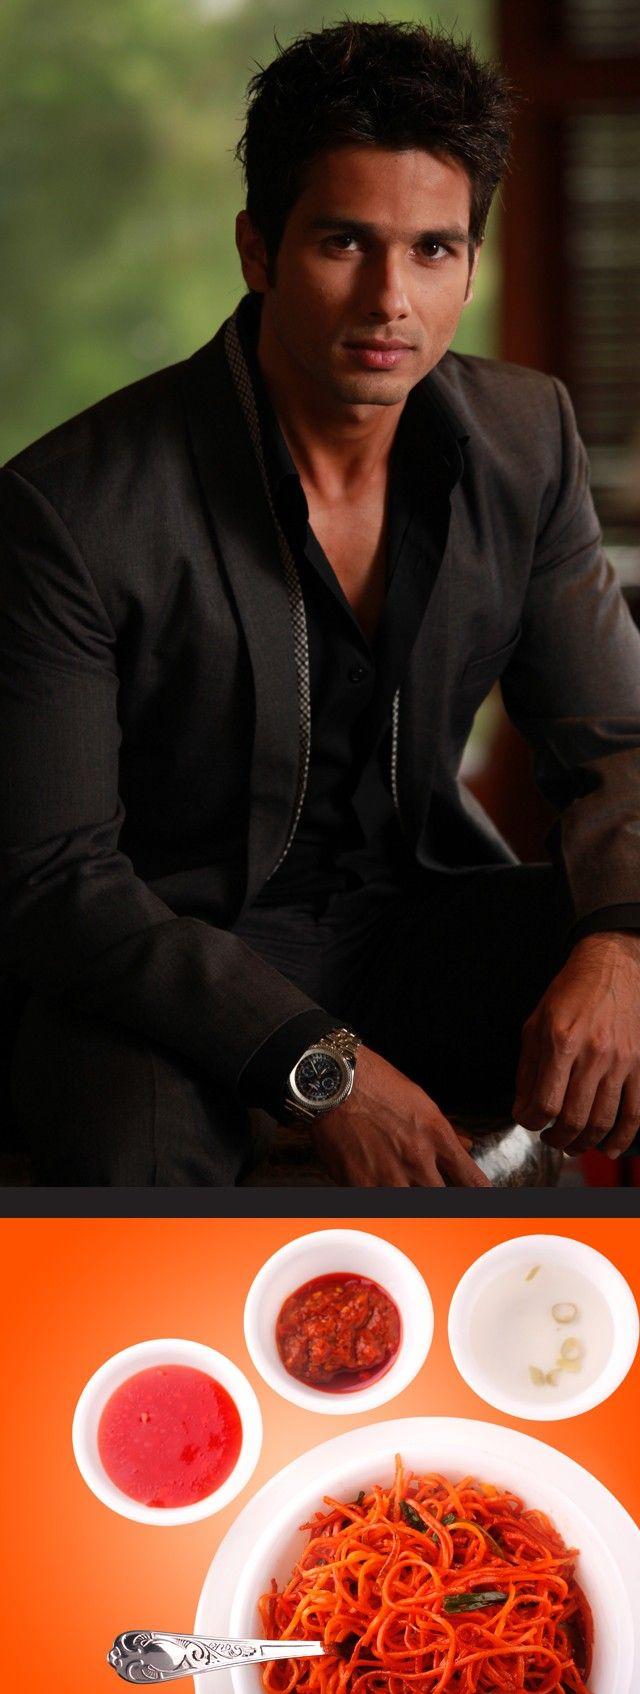 Italian Hotties Delightful shahid kapoor is a fan of chinese and italian cuisine. #bollywood